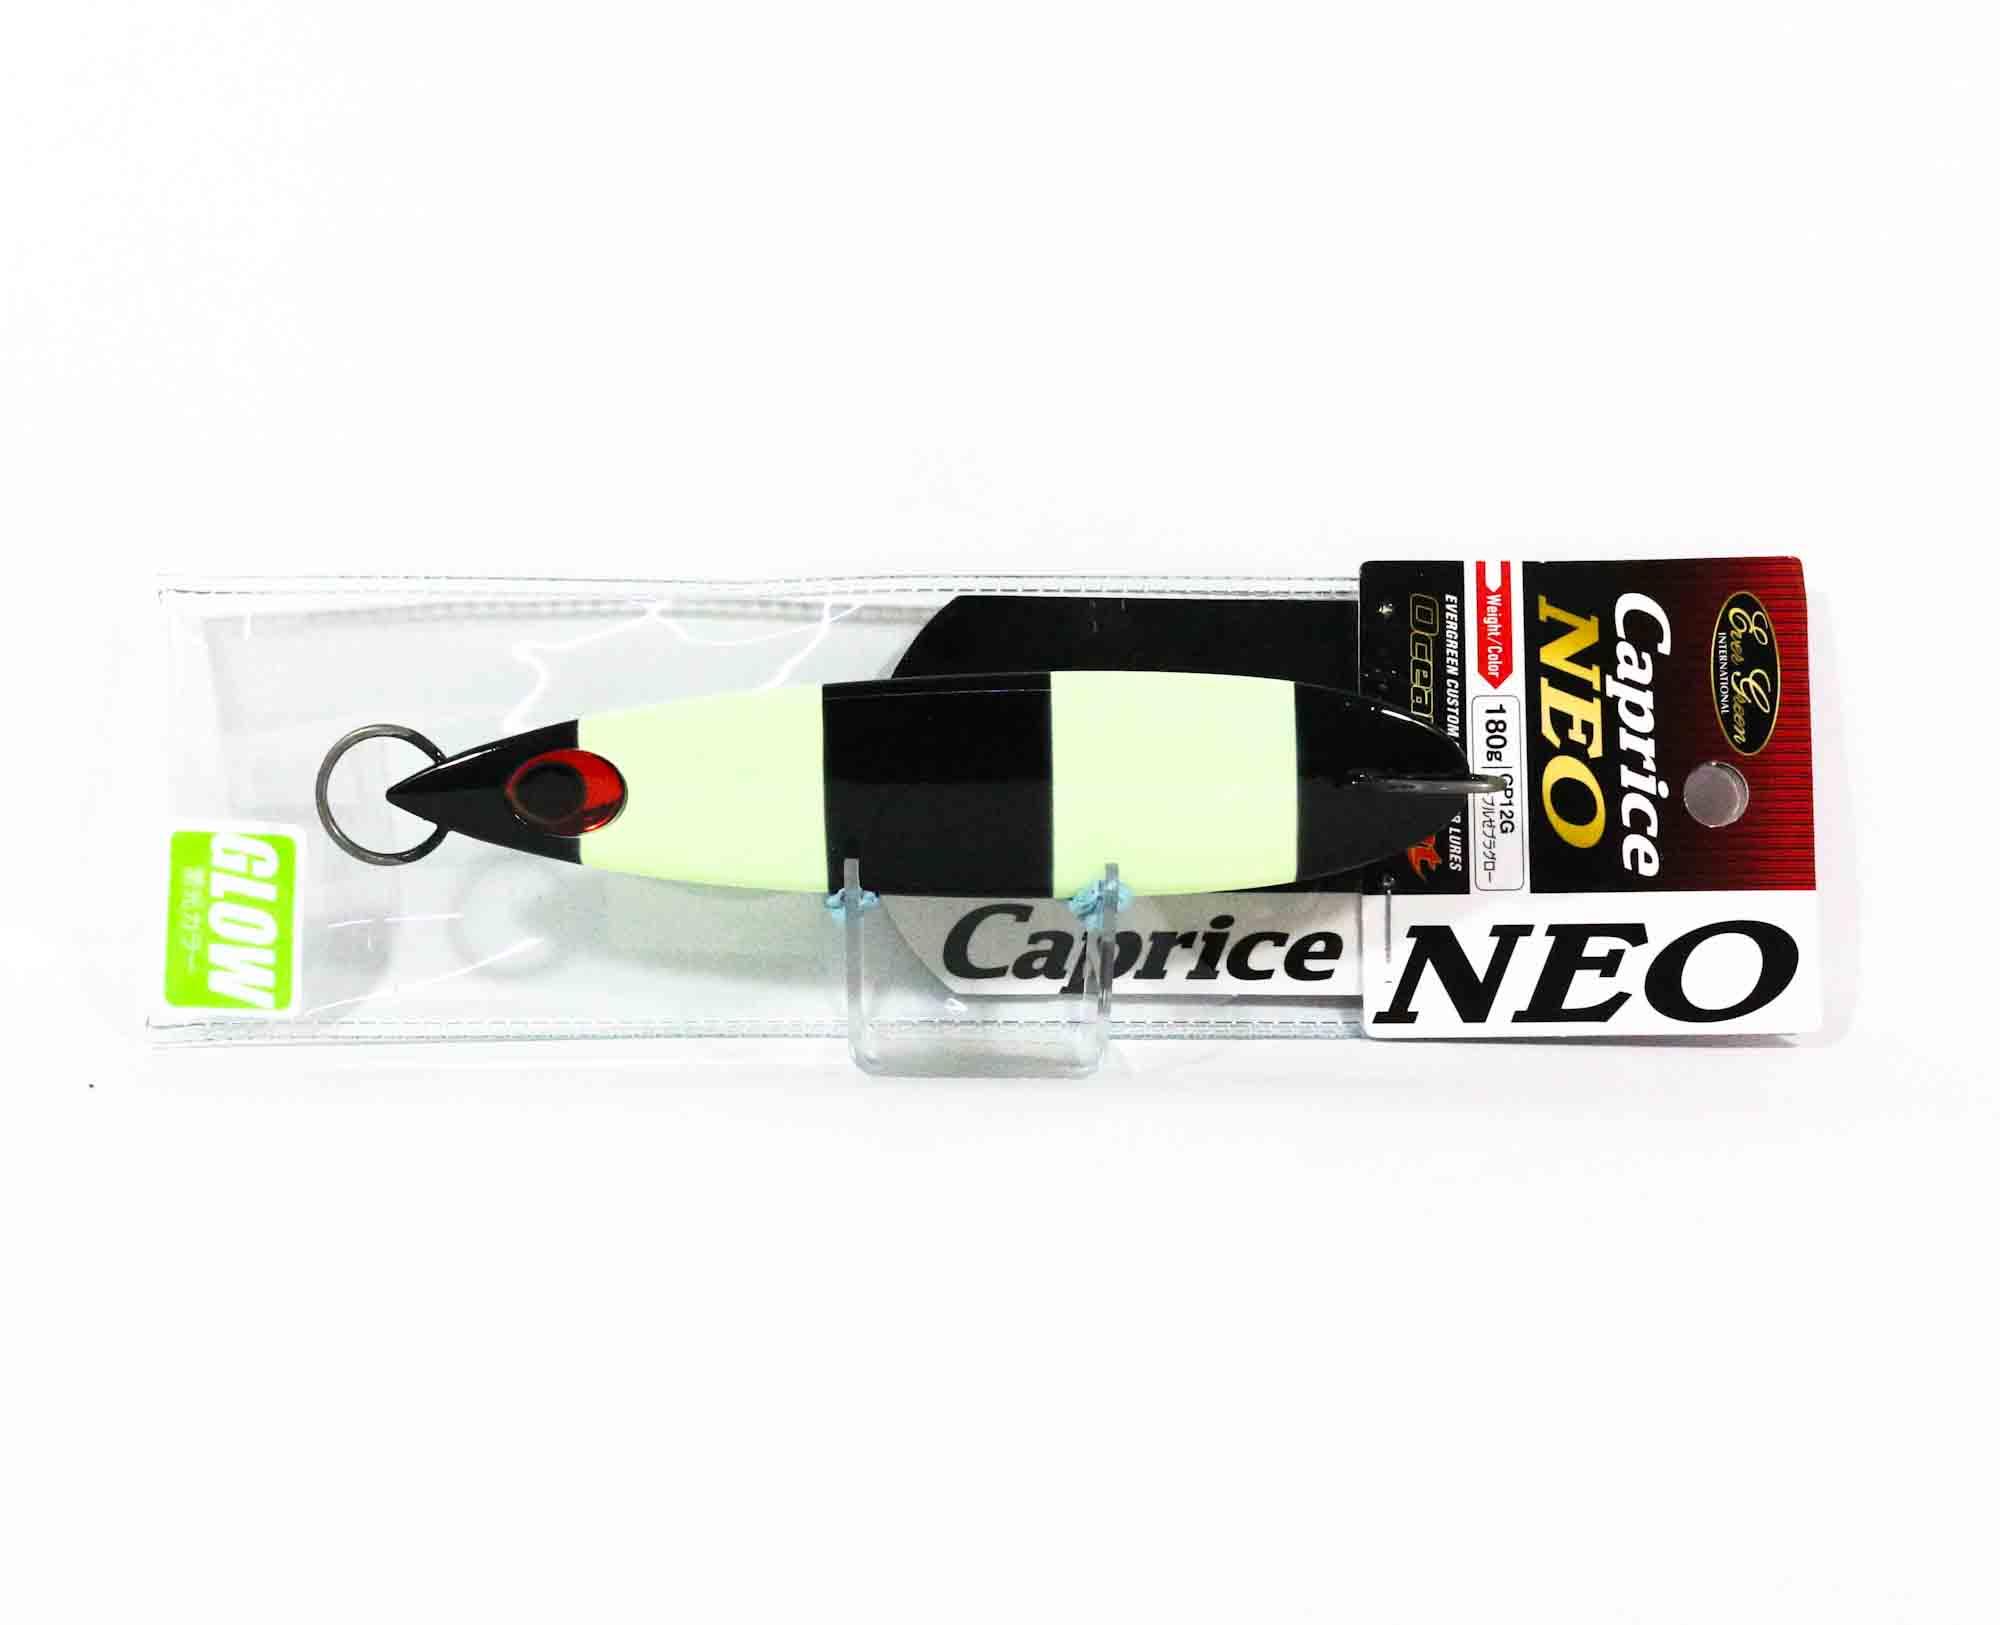 Evergreen Metal Jig Caprice Neo 180 grams CP16 4272